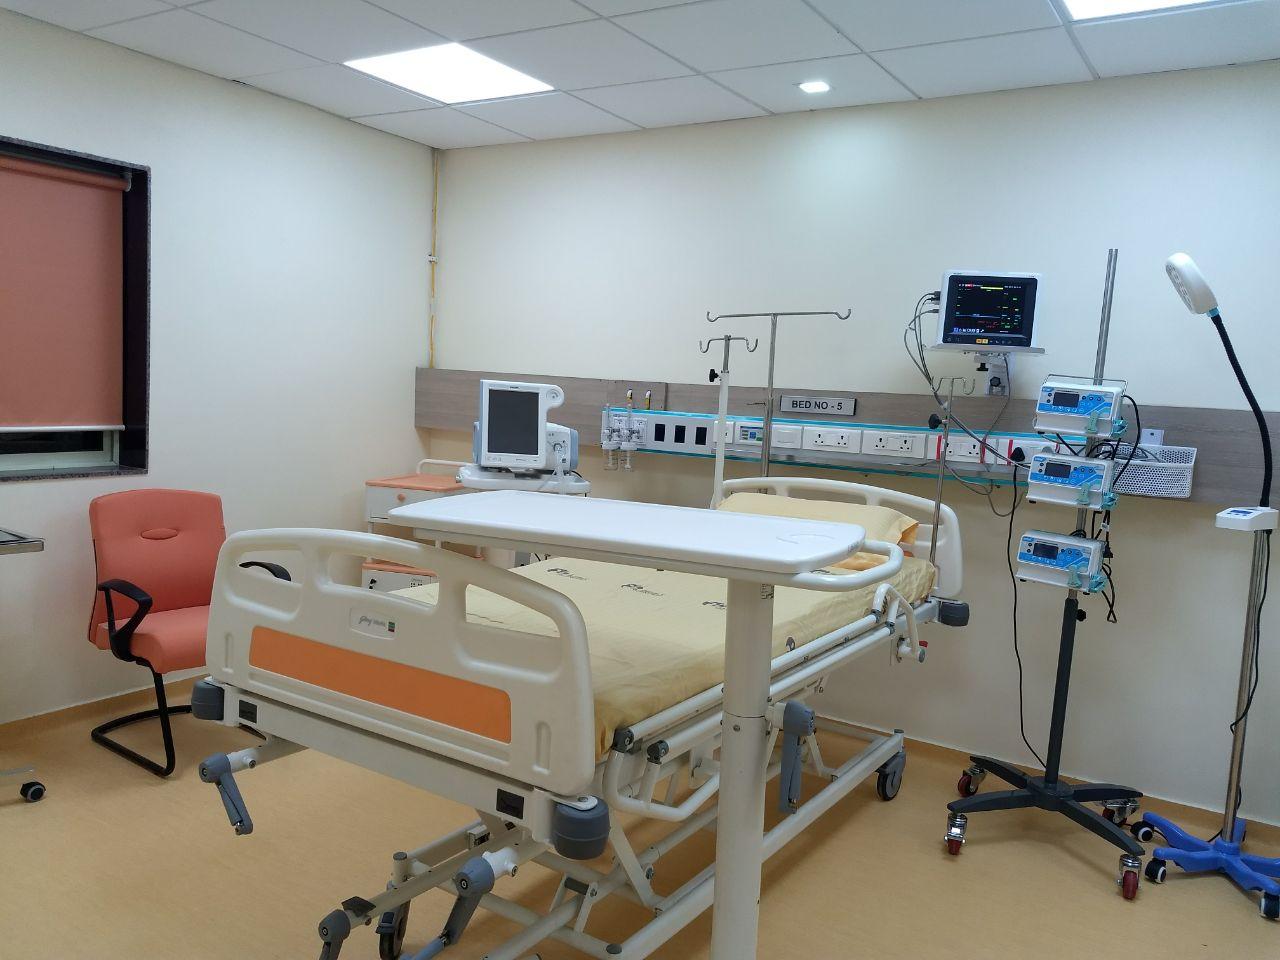 Isolation Room - District Hospital - Pithoragarh, Uttarakhand